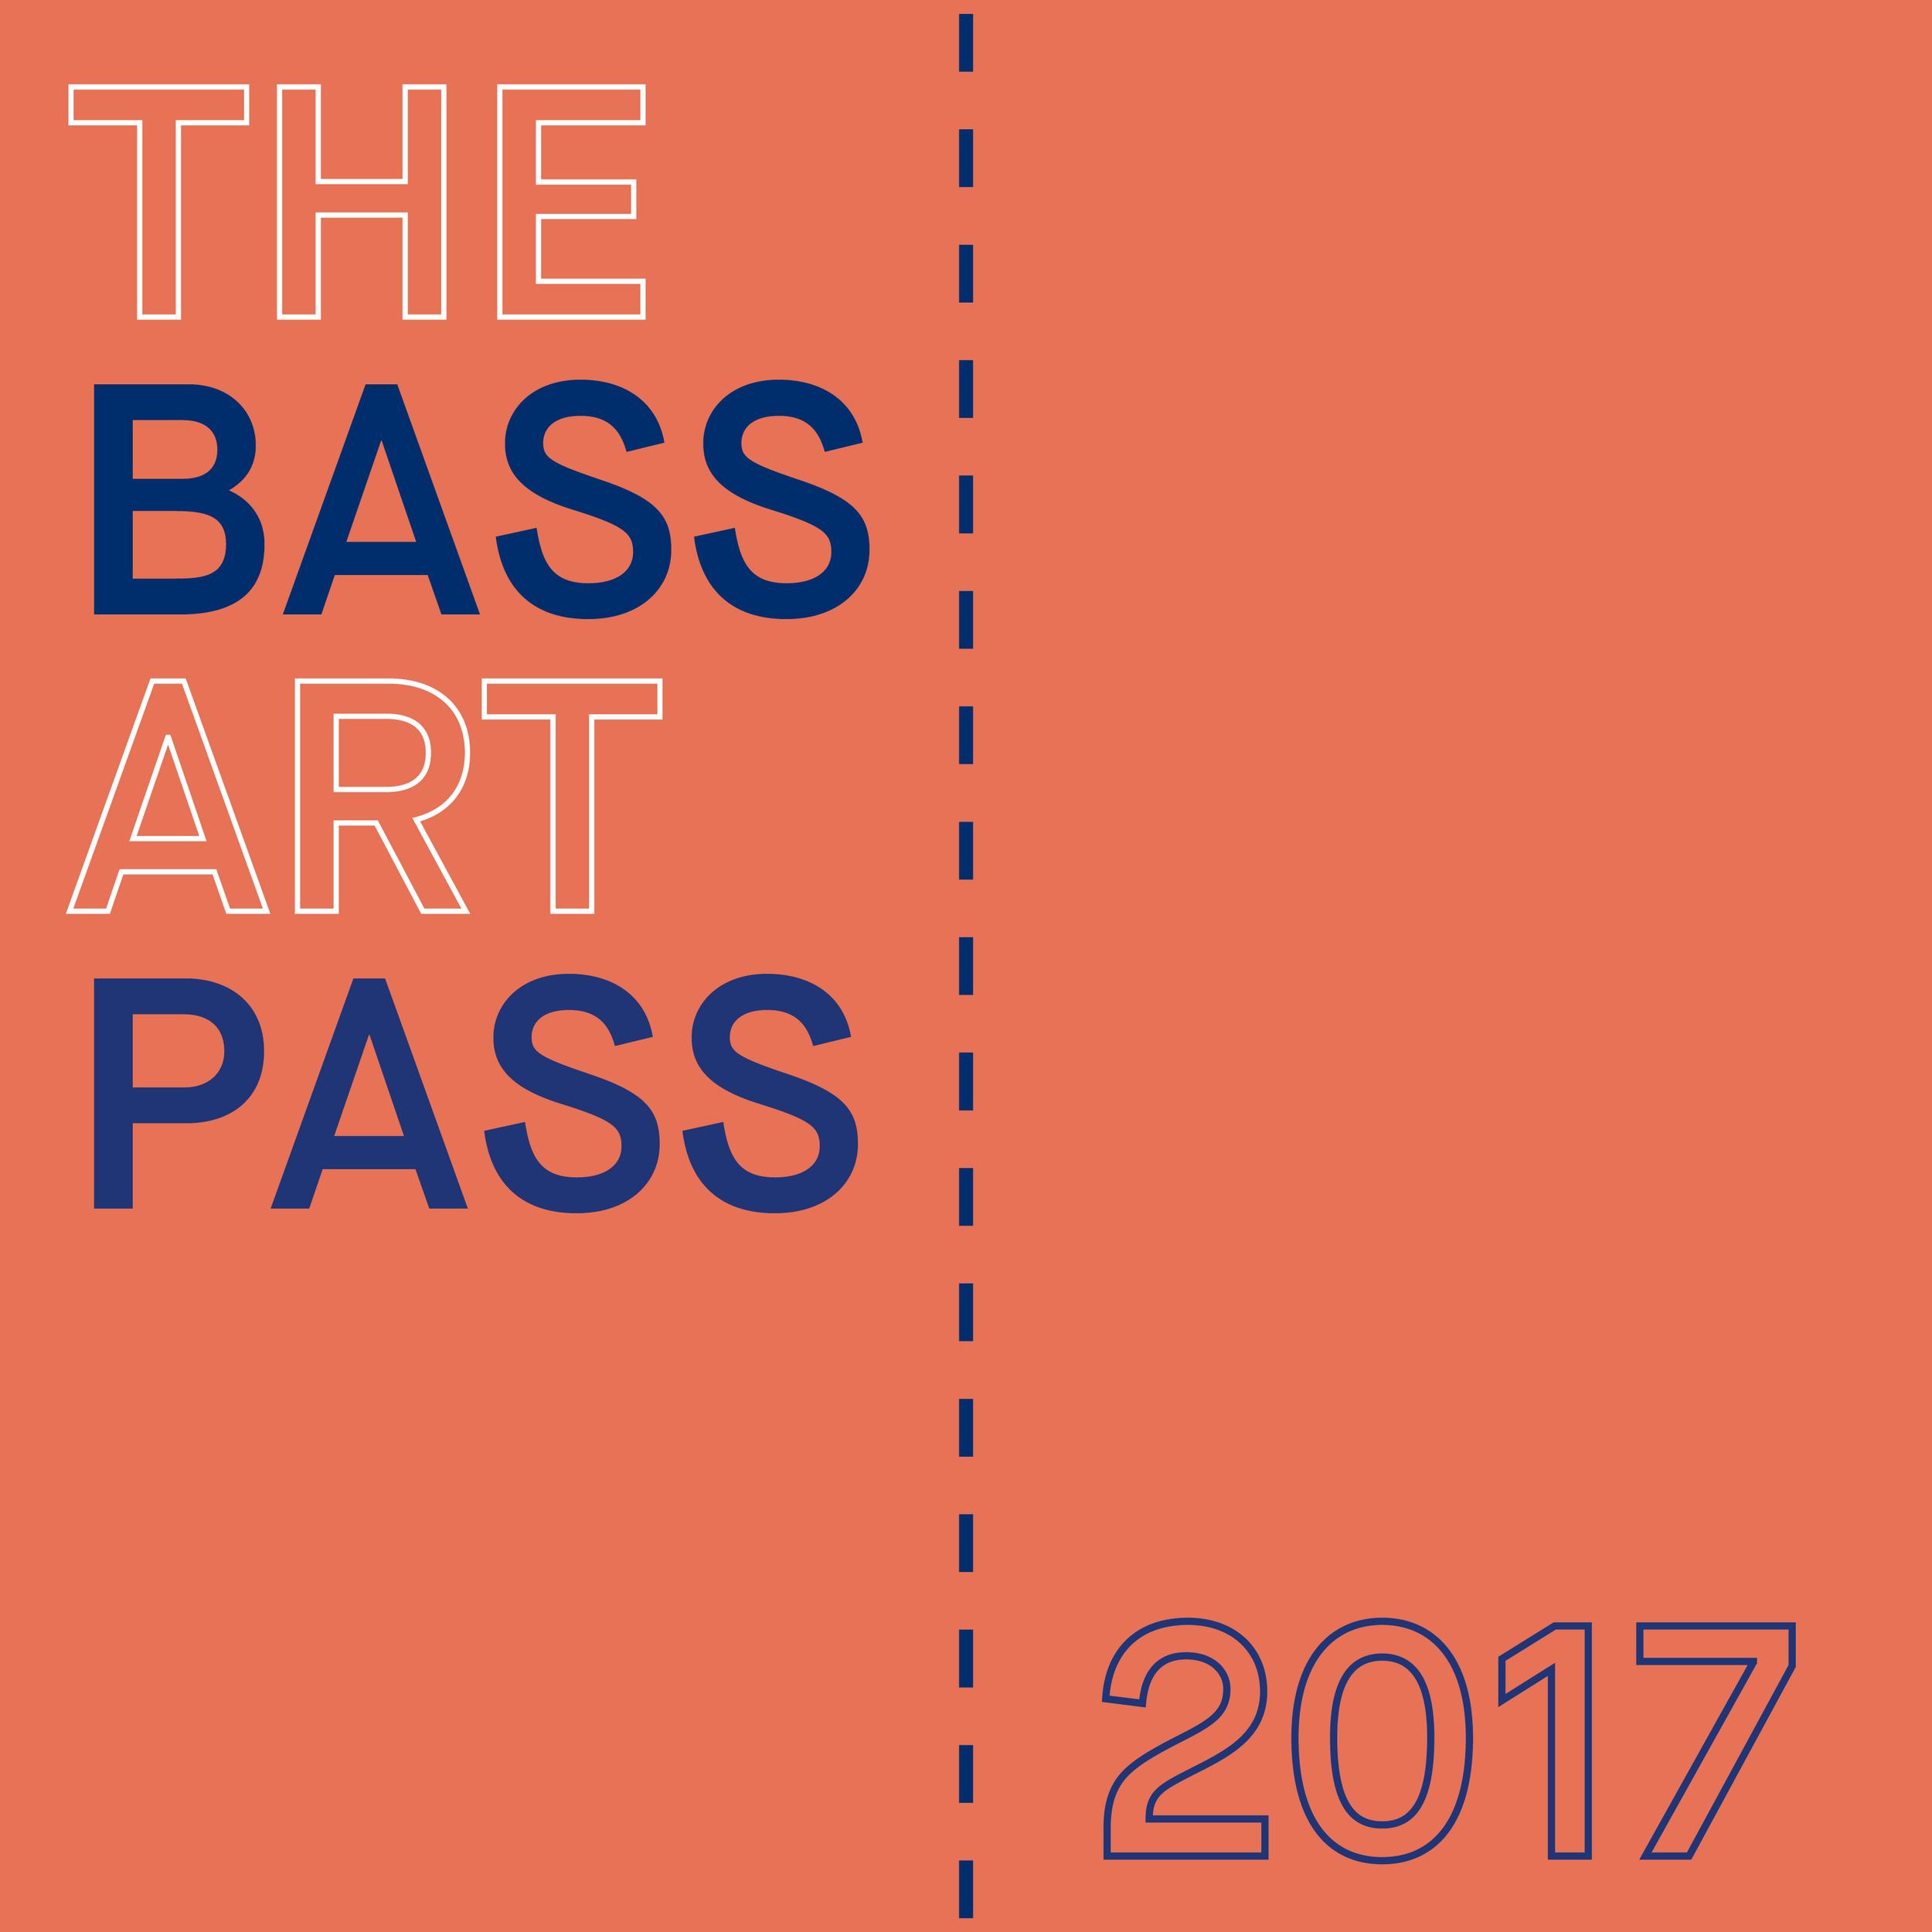 basspass_square.png